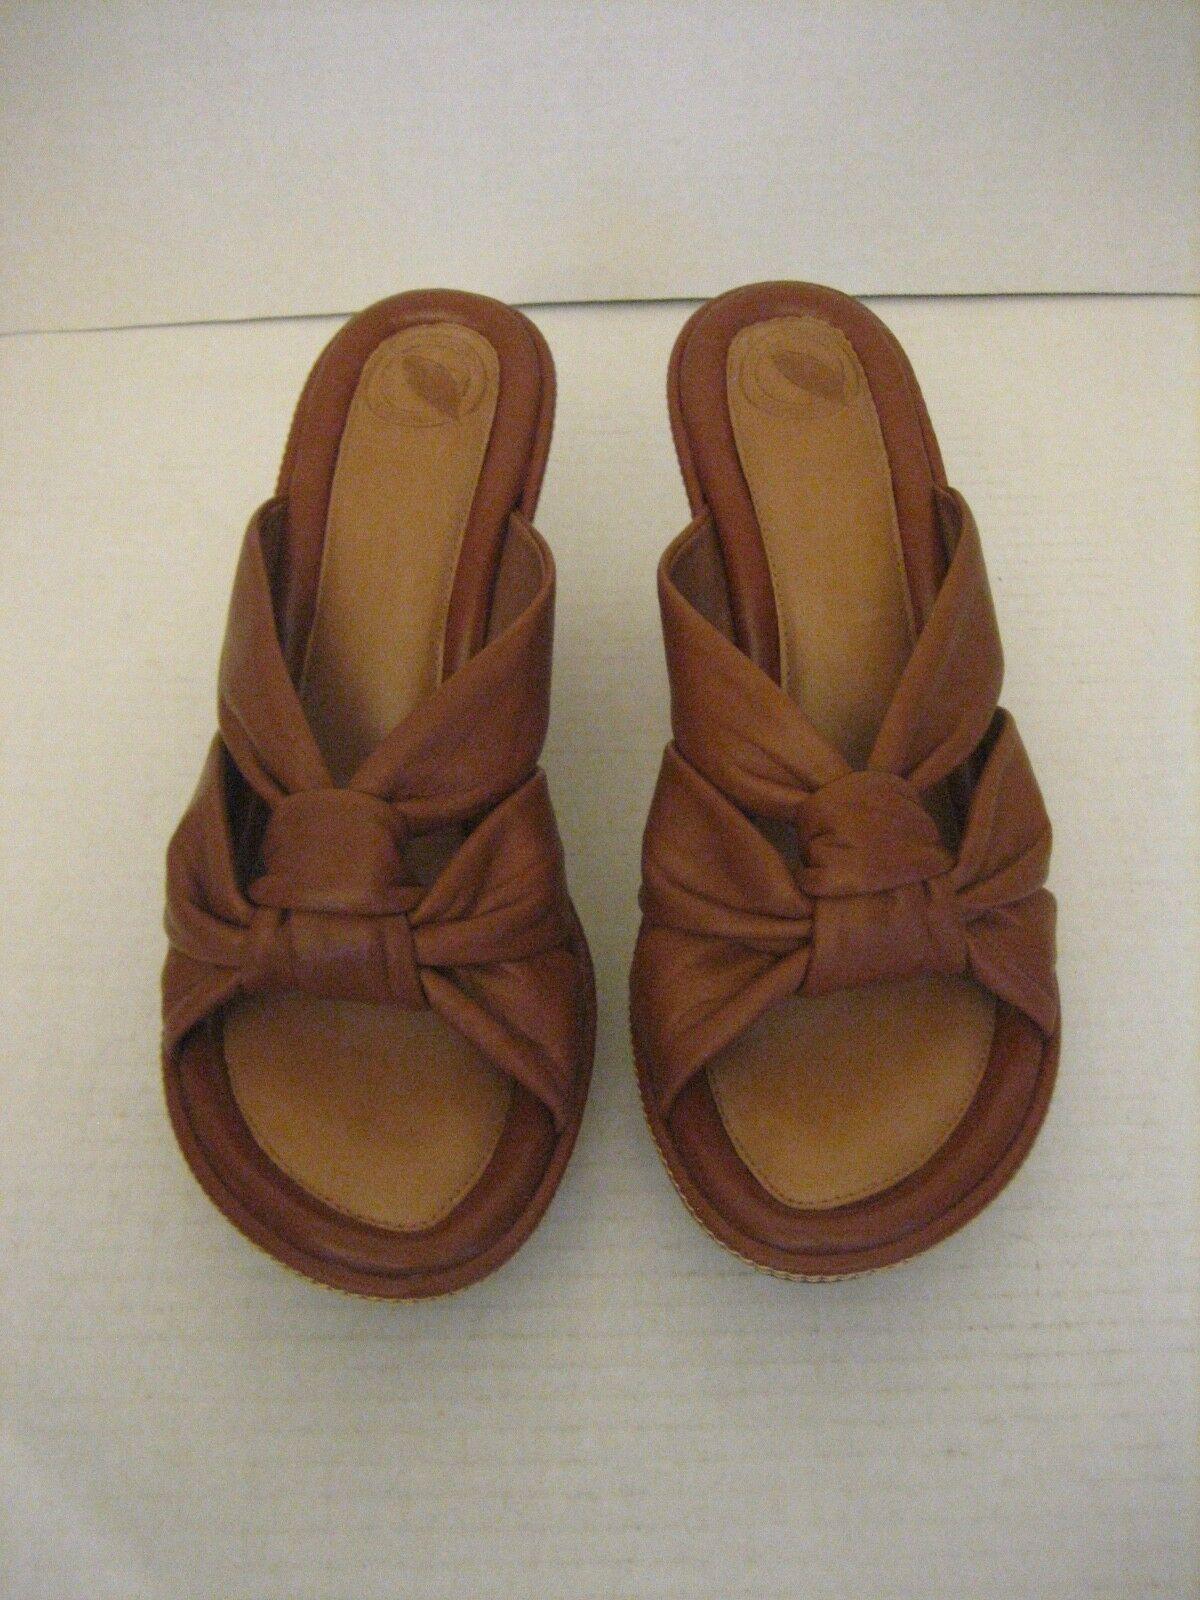 Nurture Women's Brown Leather Cork Wedge High Heel Slip On shoes Sz 7 1 2 NWNB